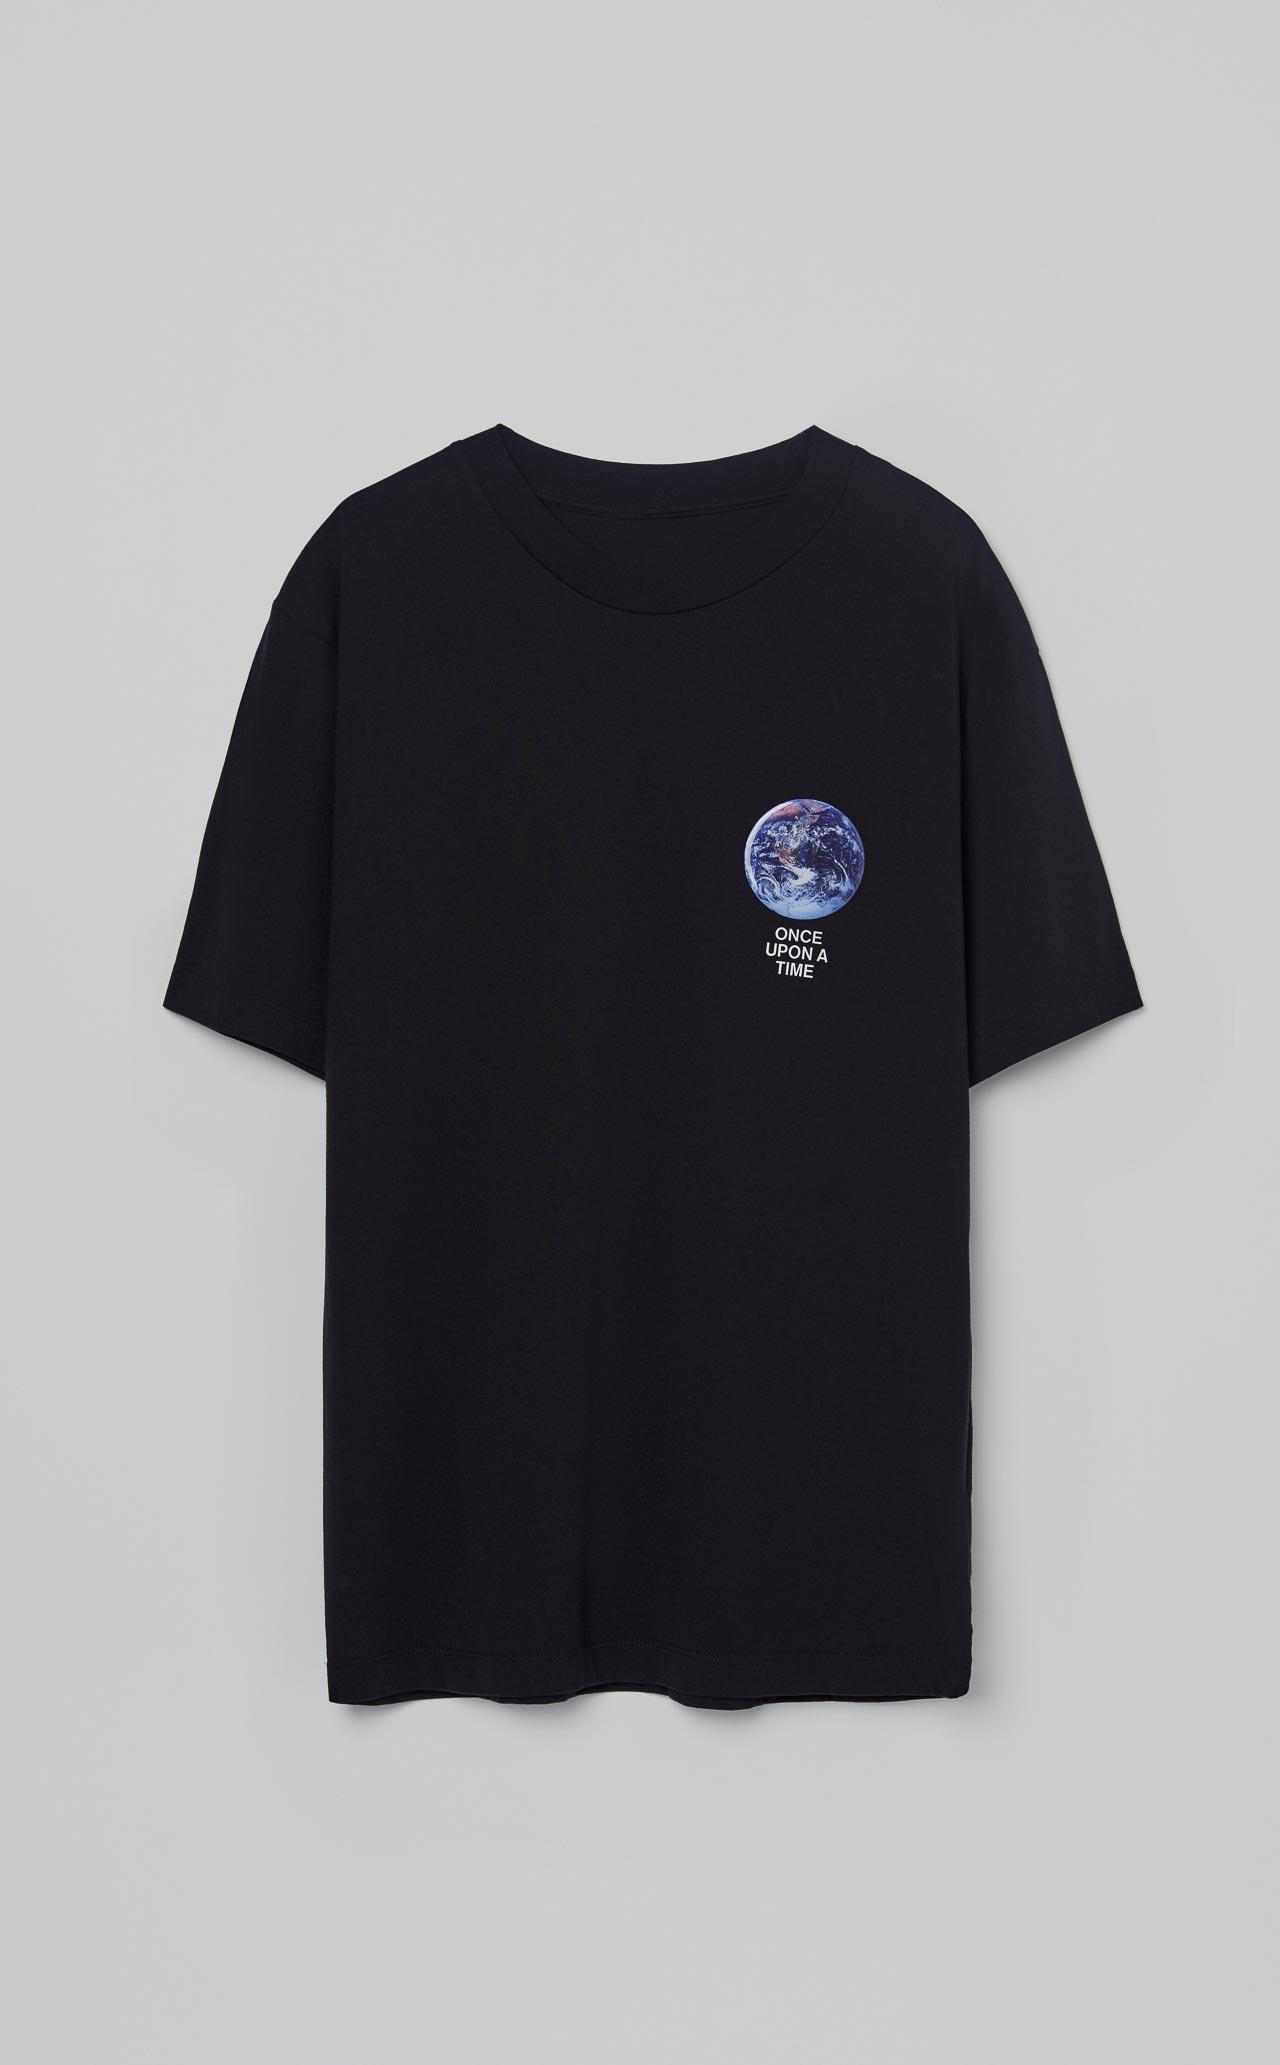 Camiseta Once